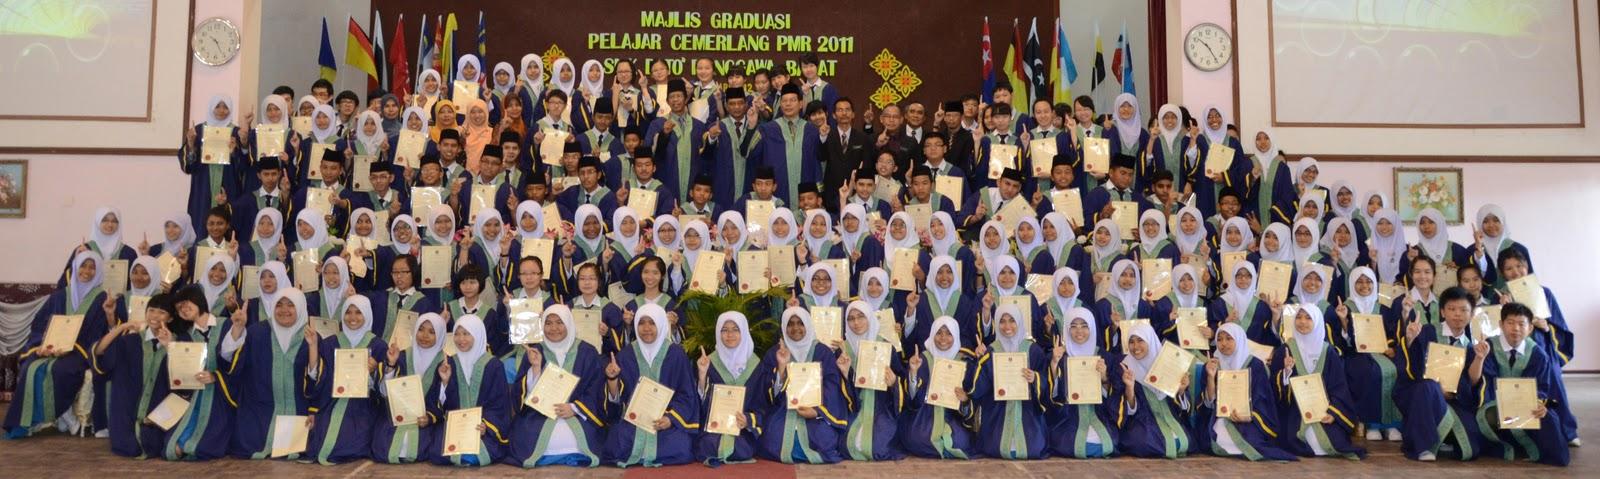 Smkdpb Majlis Graduasi Pelajar Cemerlang Pmr